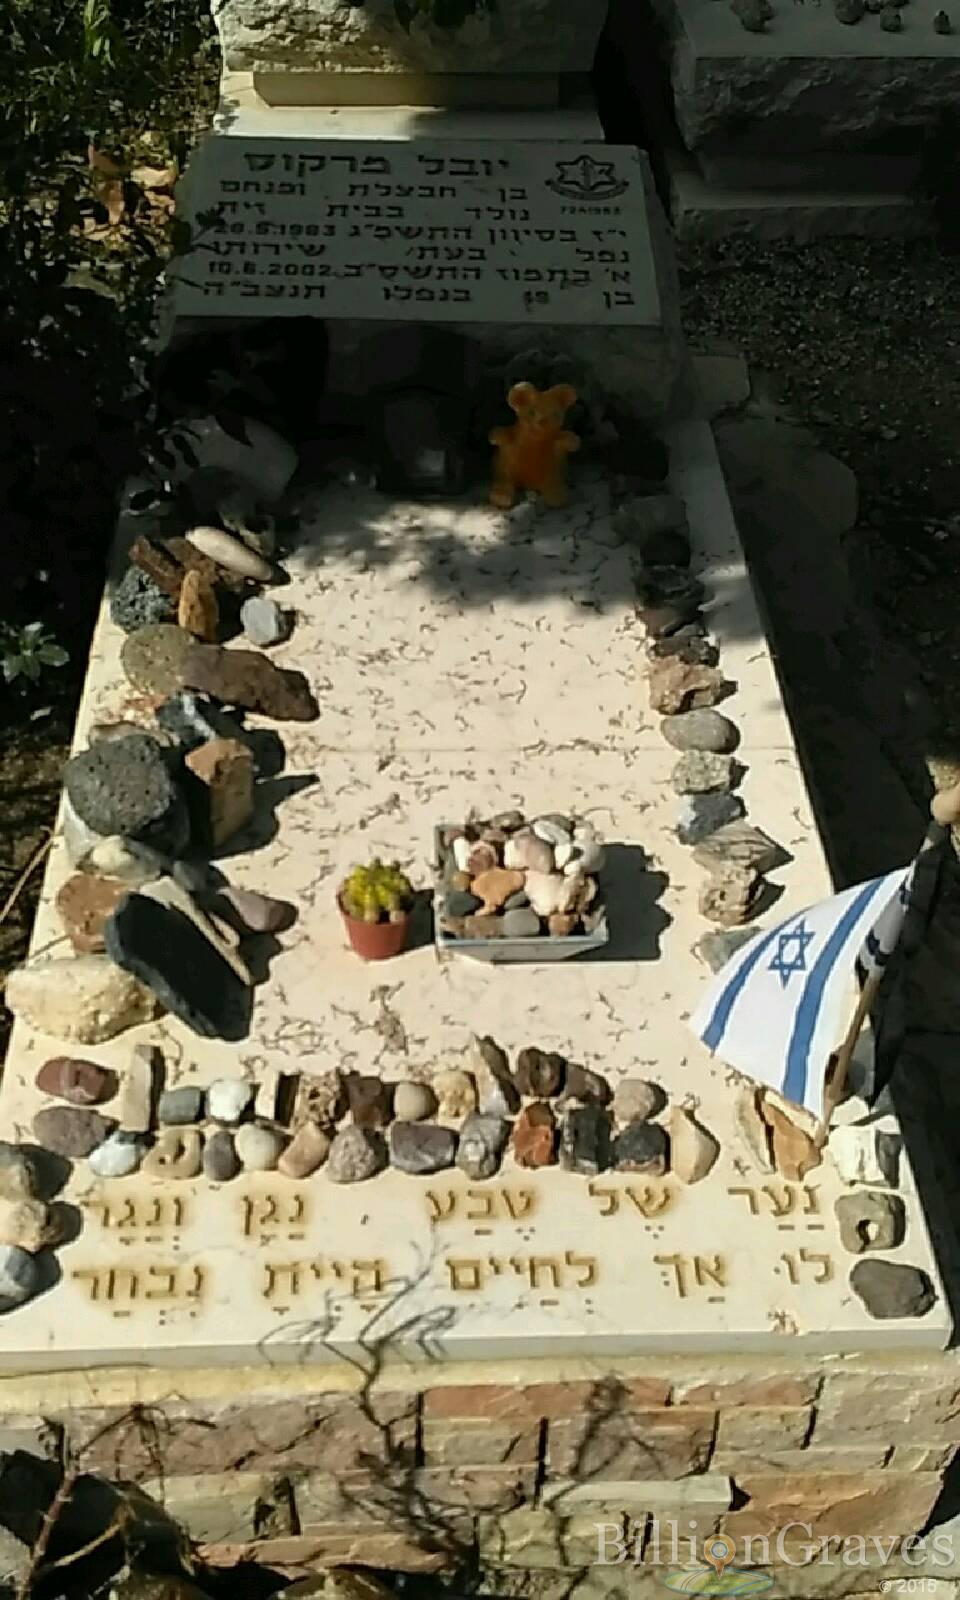 BillionGraves, Jewish, genealogy, family history, GPS, BillionGraves app, Israel, Jew, Hebrew, cemetery, grave, gravestone, rocks, symbols